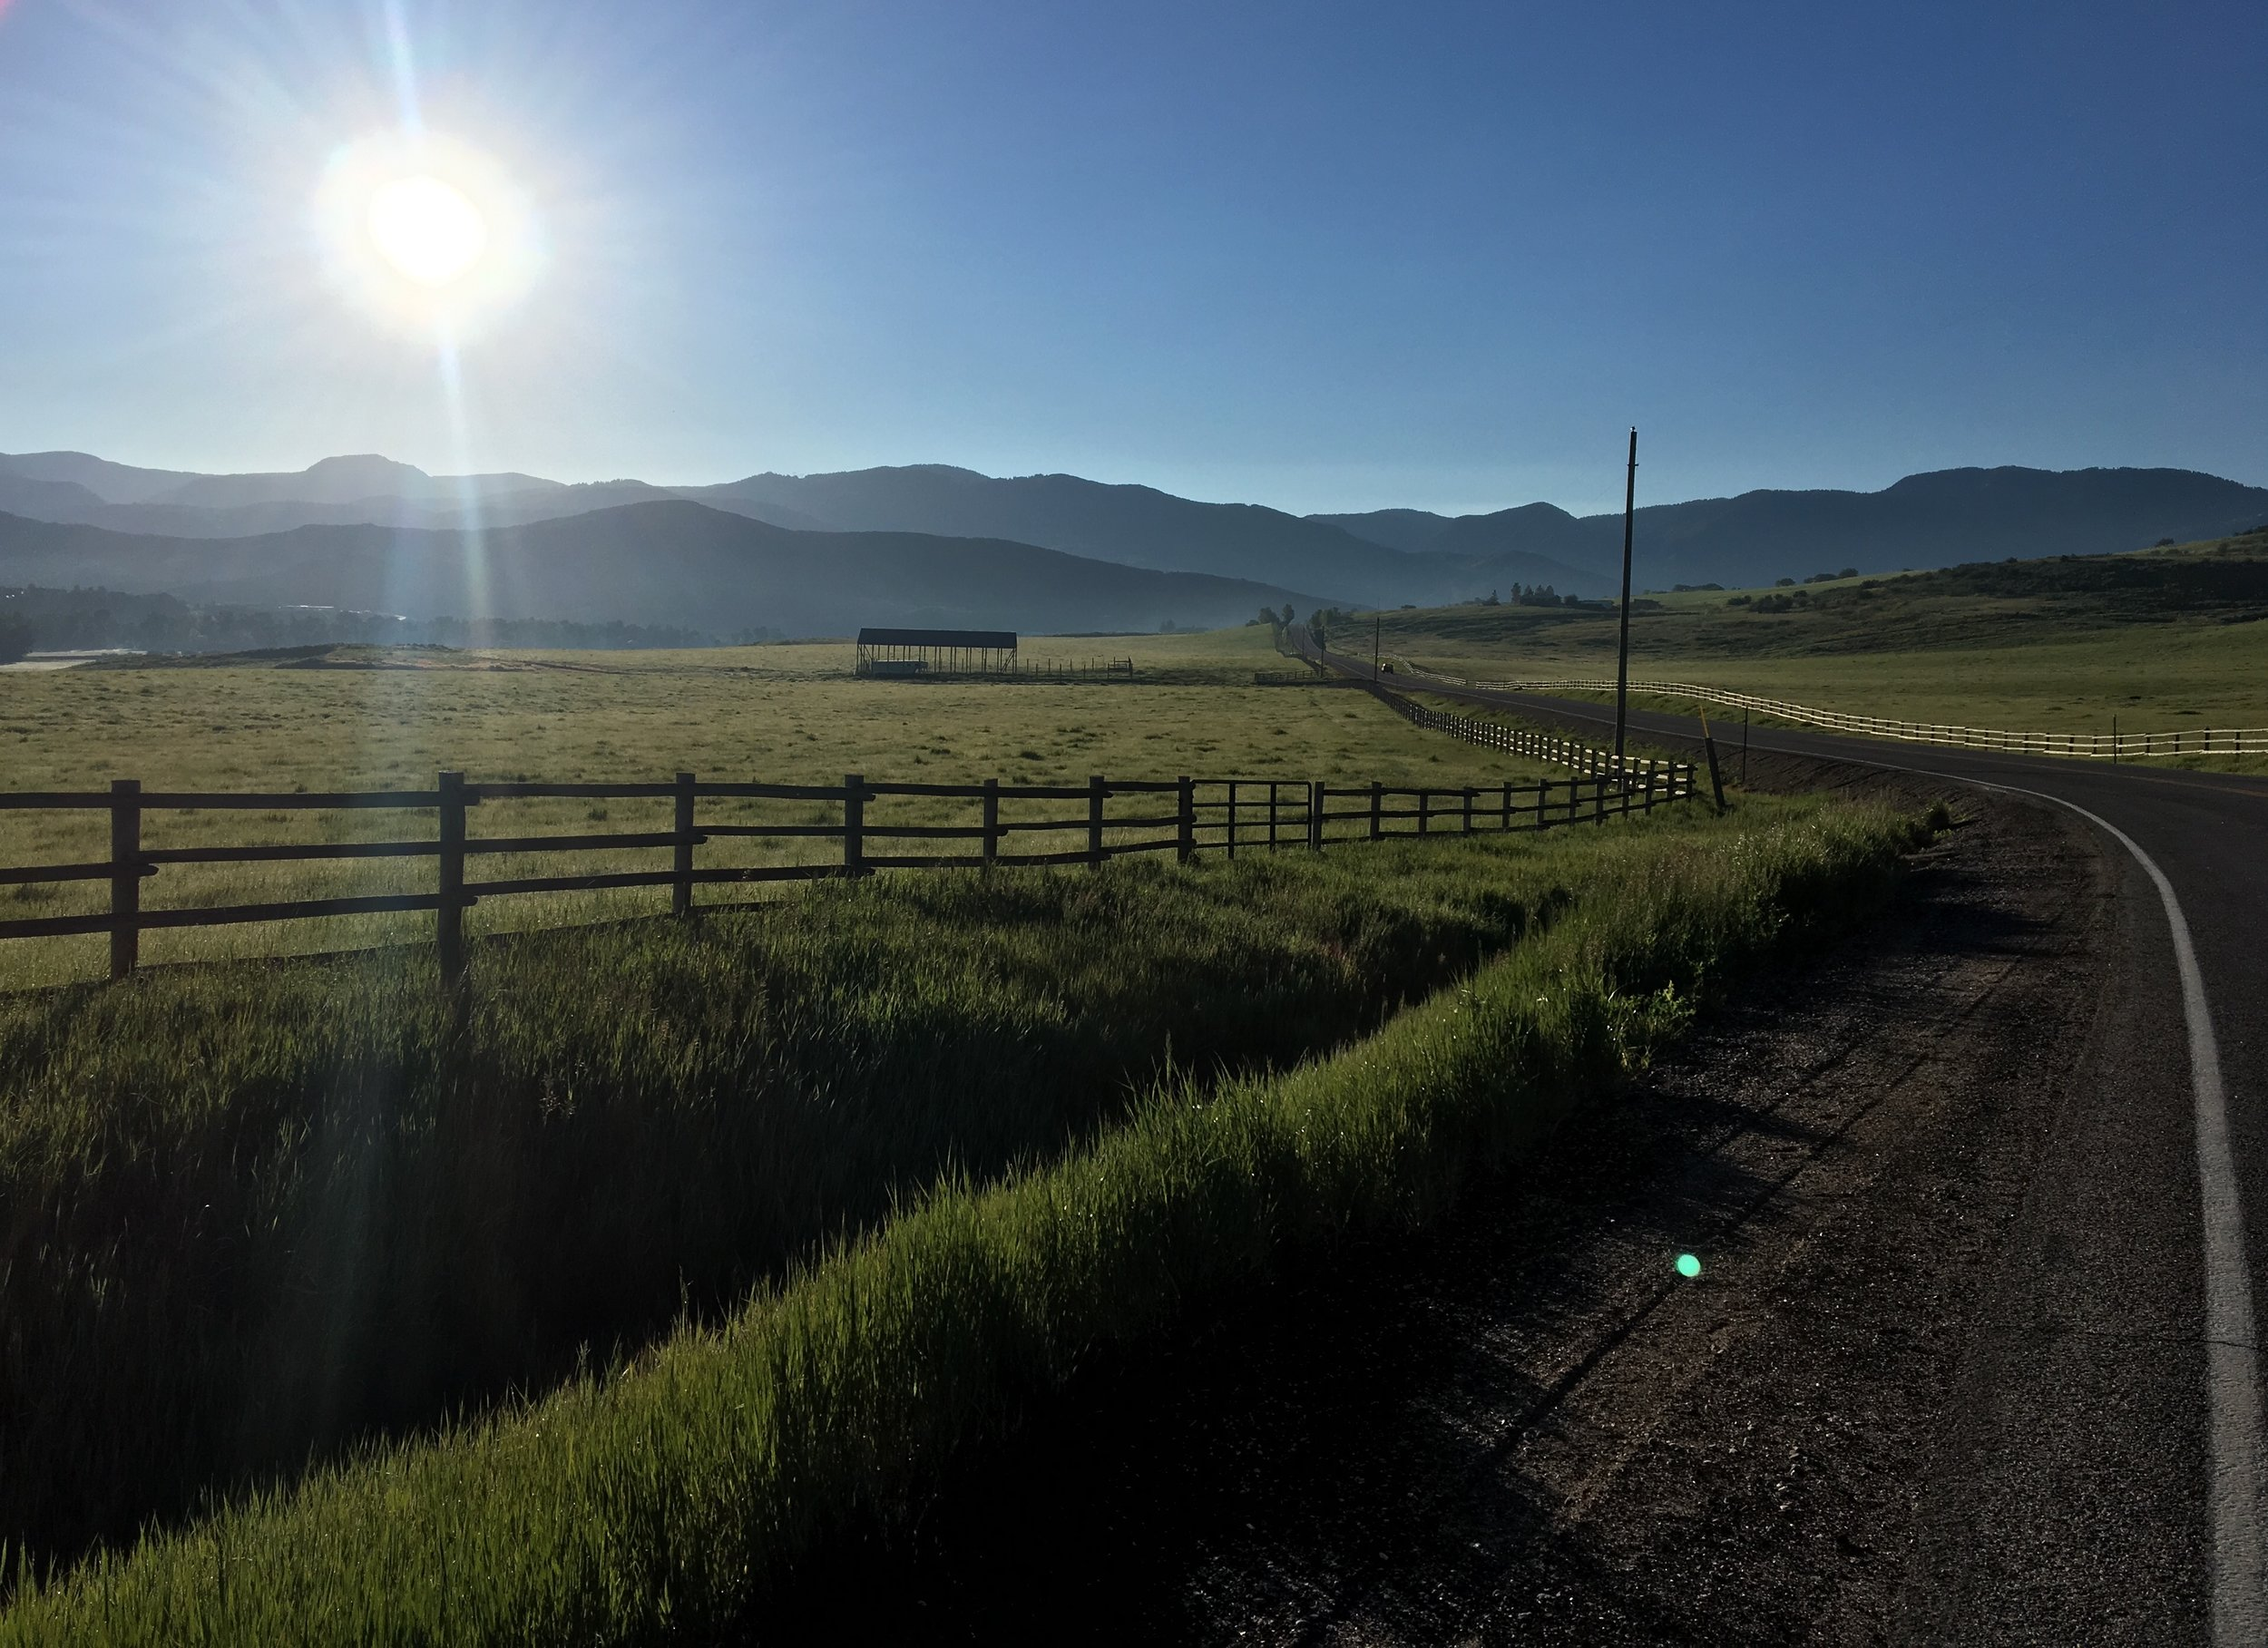 Morning Run! I forgot how beautiful Summer Mornings can be!